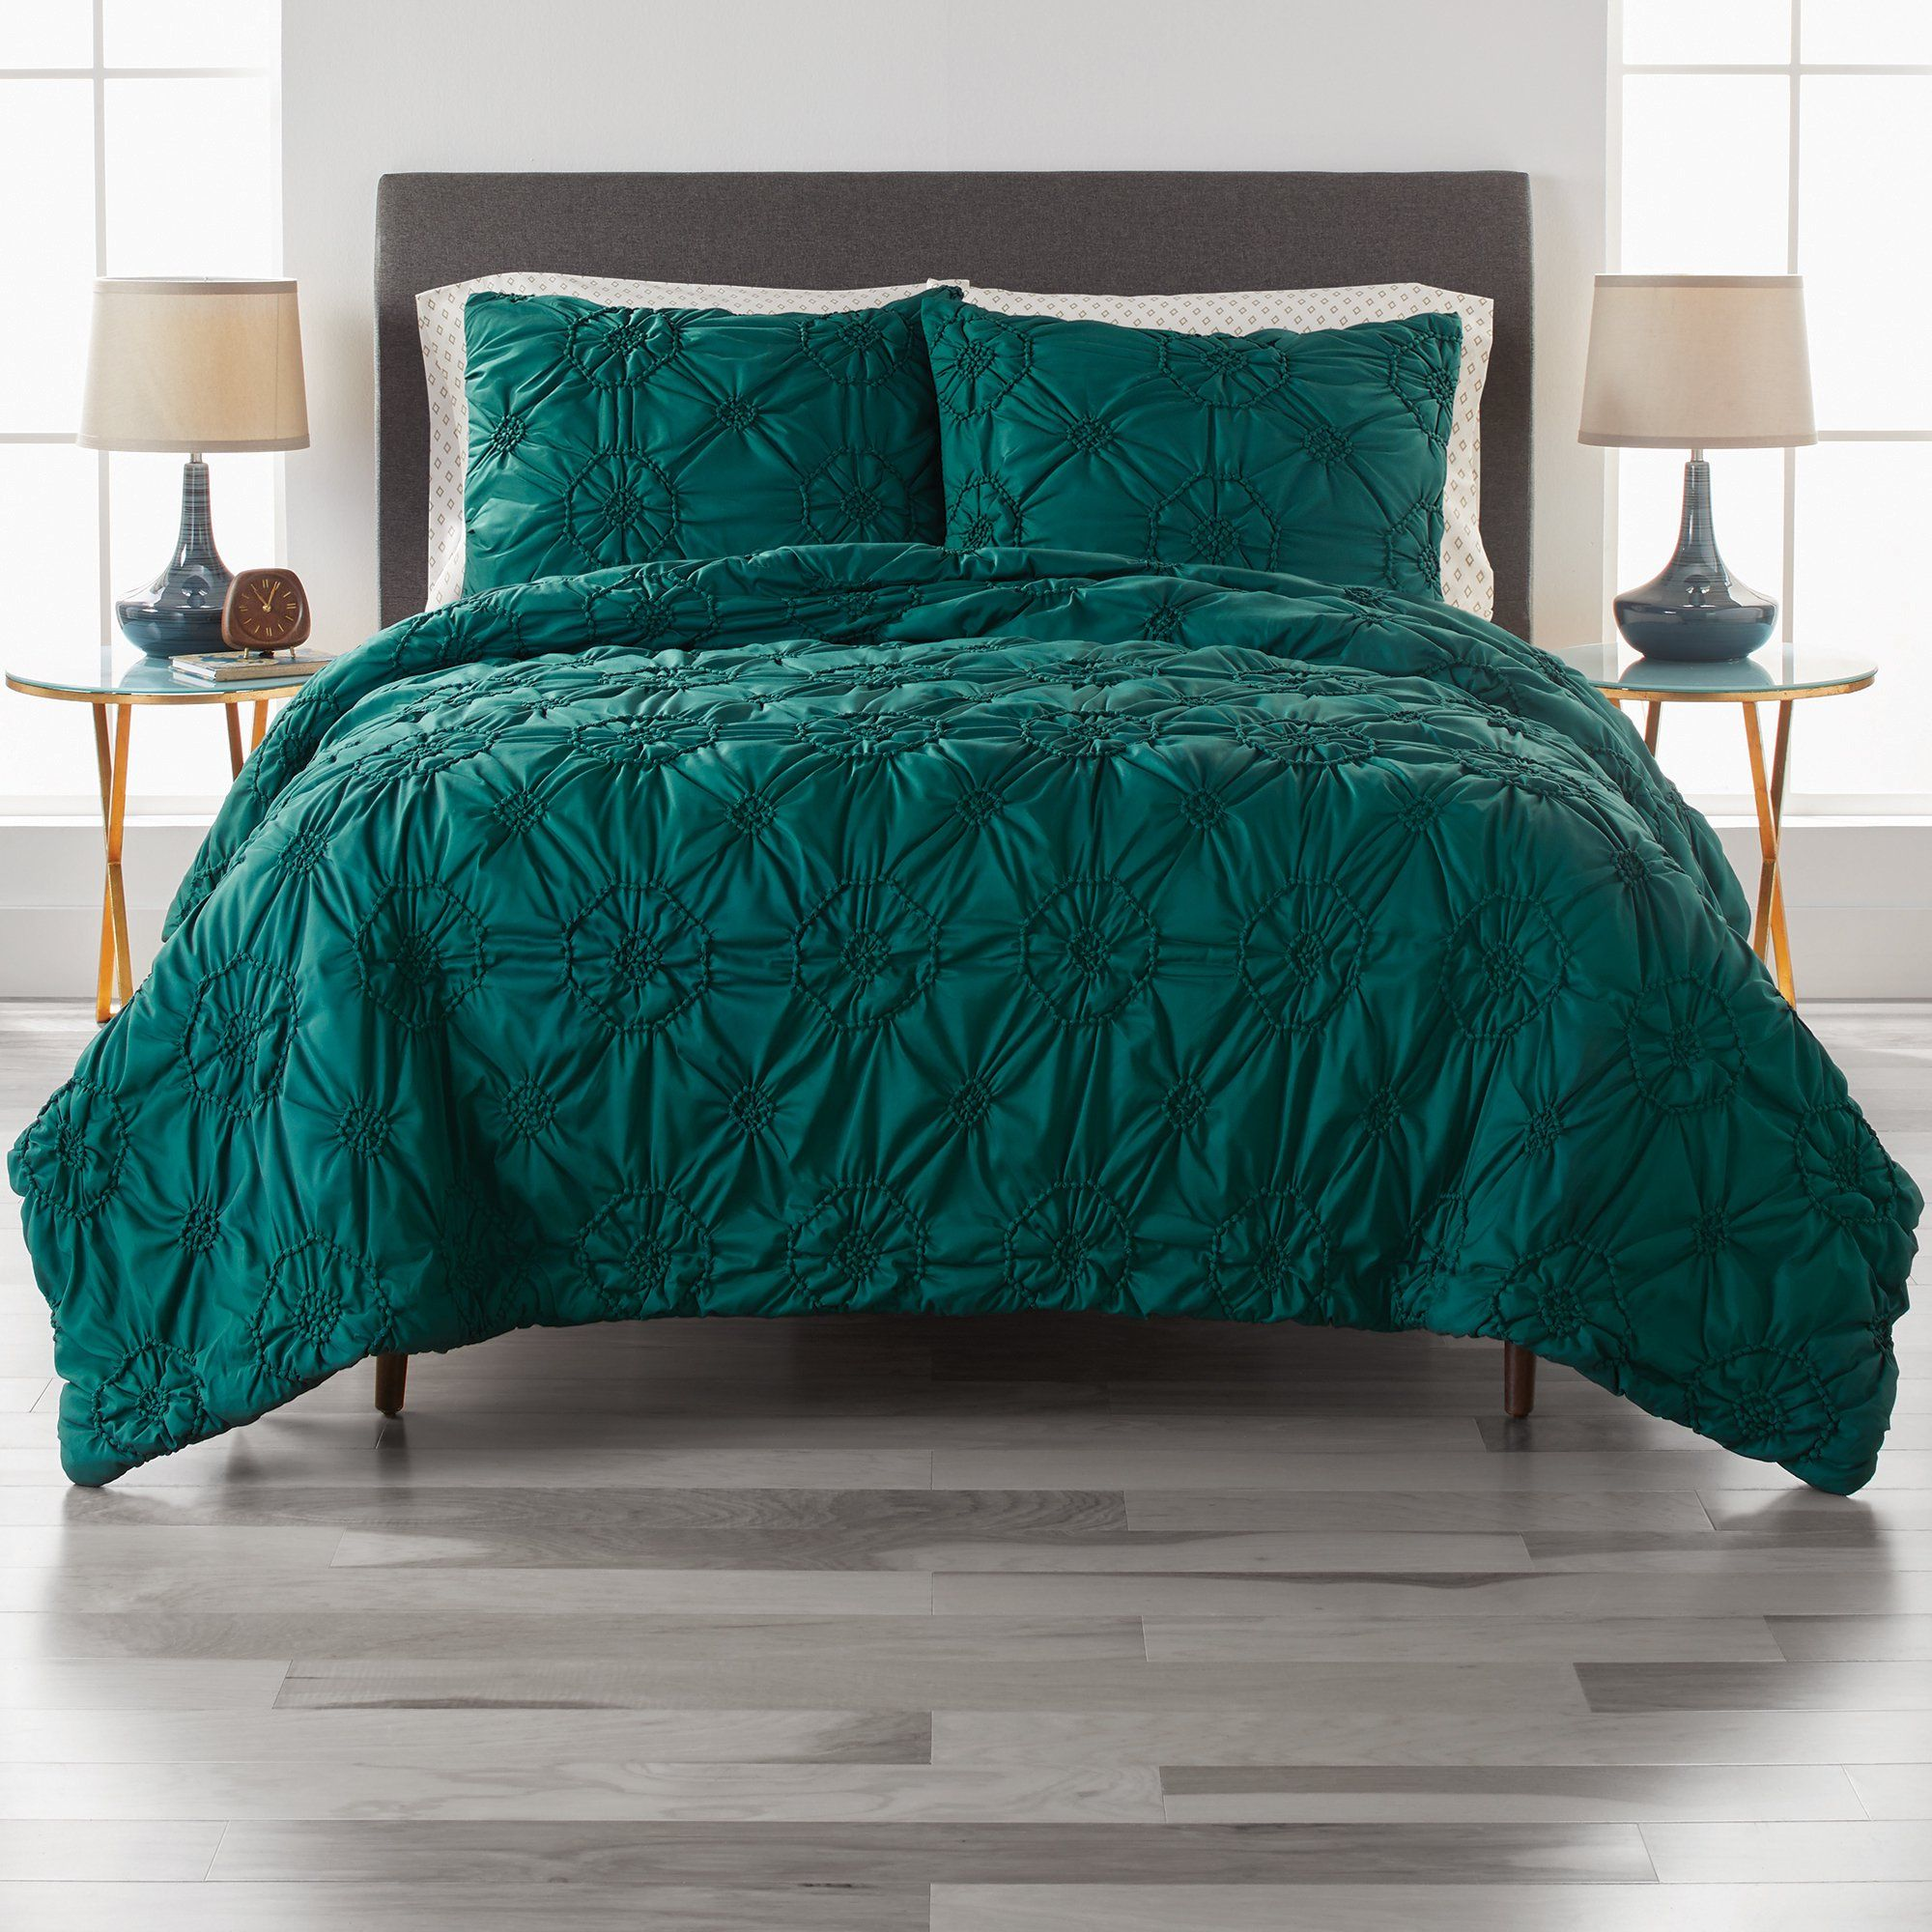 9b40c4b3baf6ad7f142038fb29ec2728 - Better Homes And Gardens 11 Piece Comforter Set